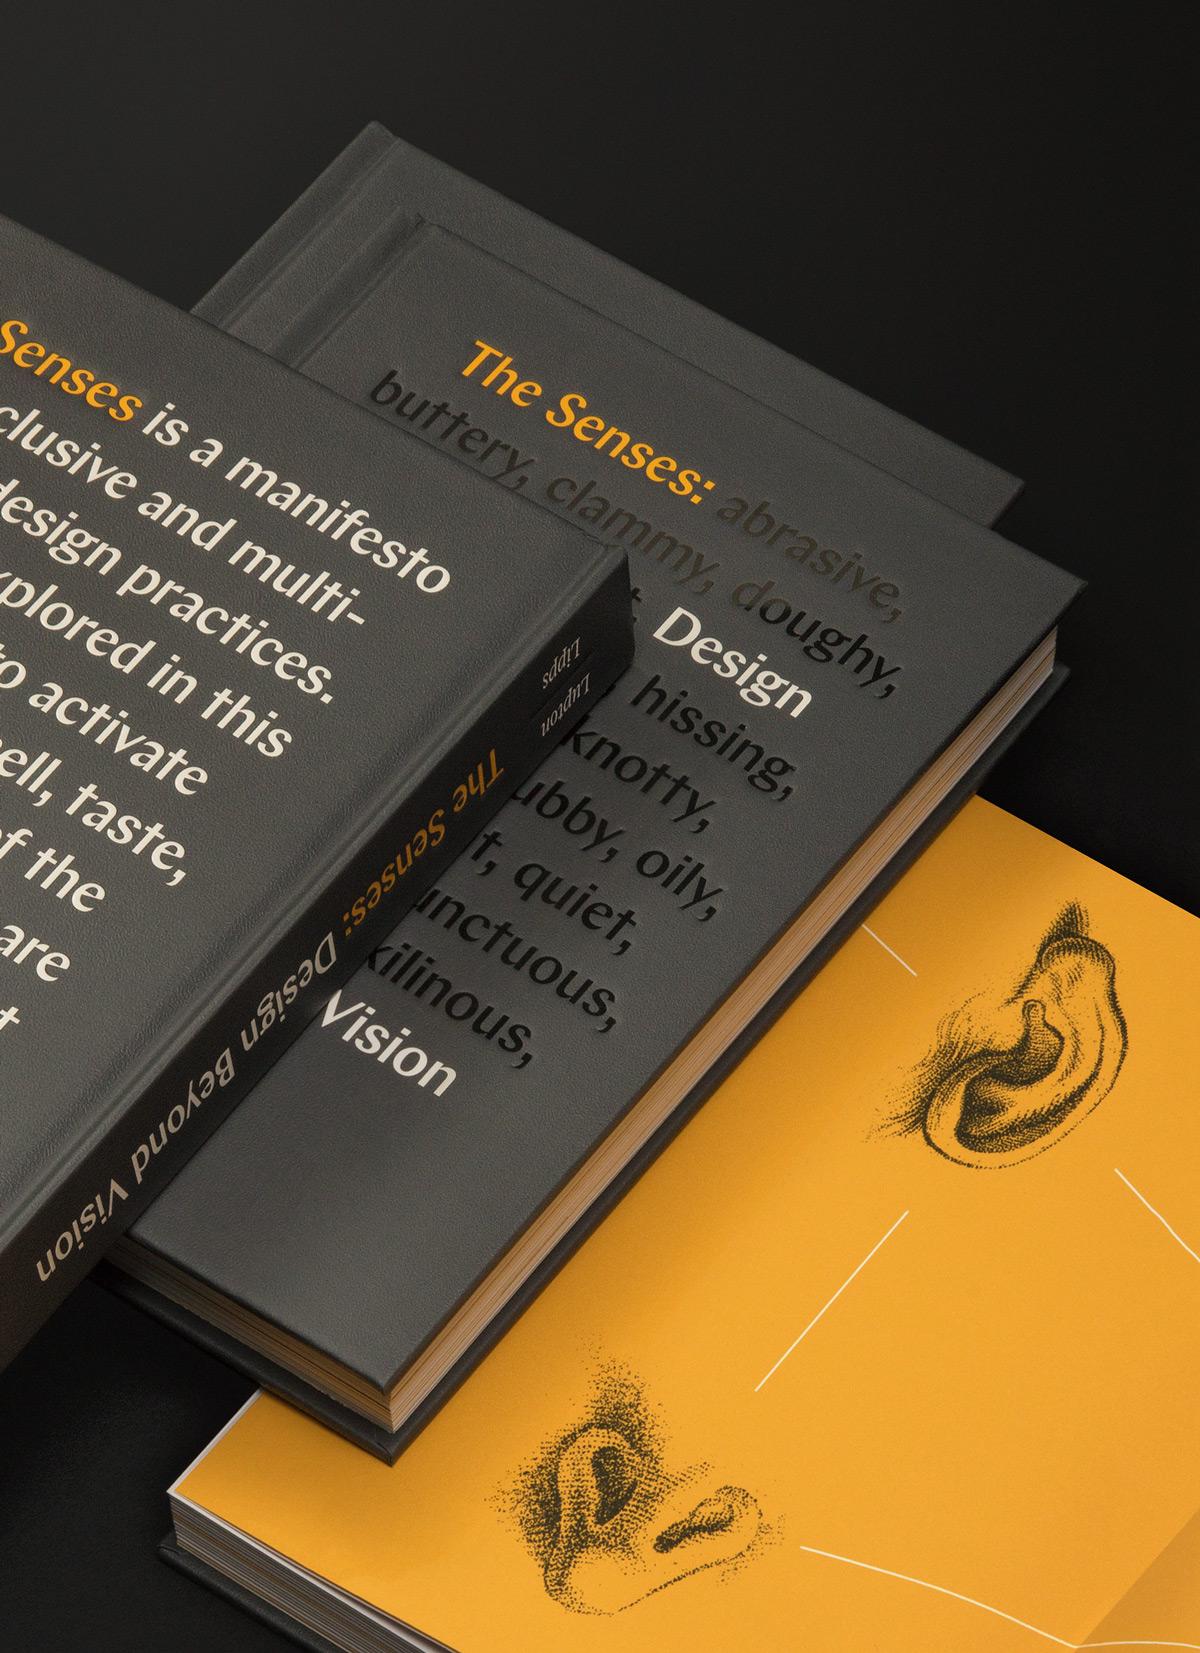 TheSenses_Book_Leaf.jpg